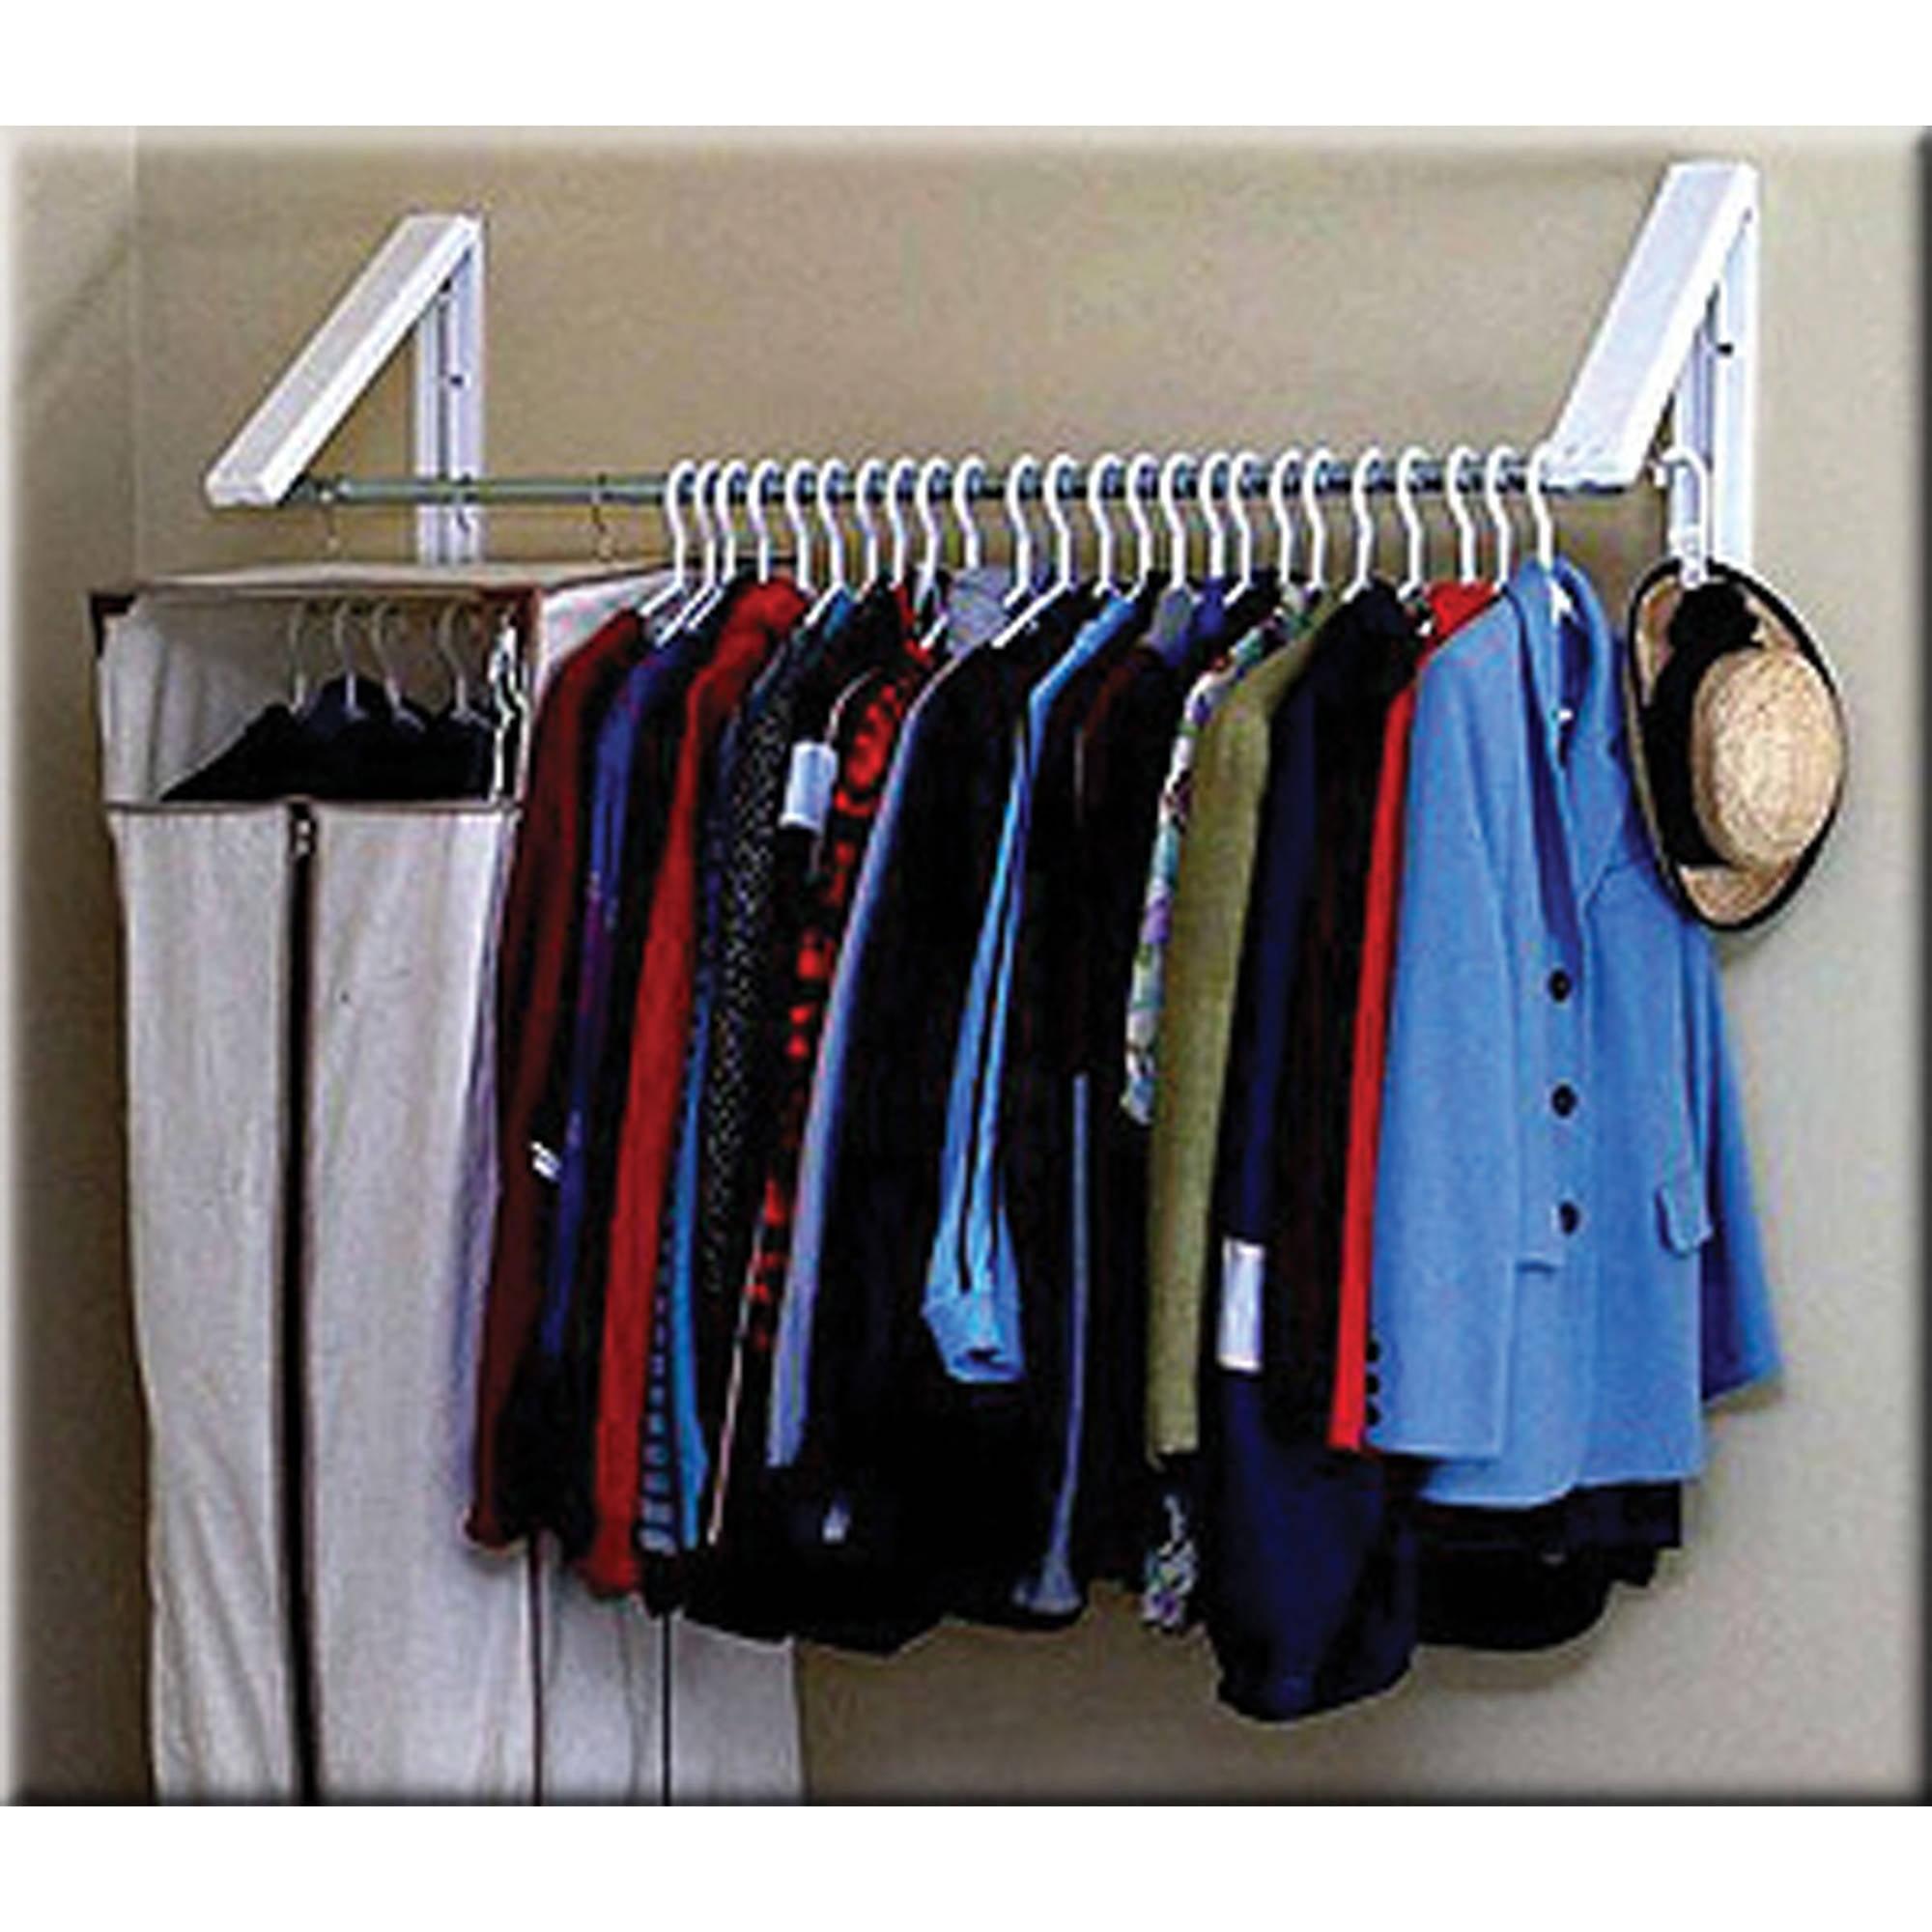 InstaHANGER QuikCLOSET Clothes Storage System